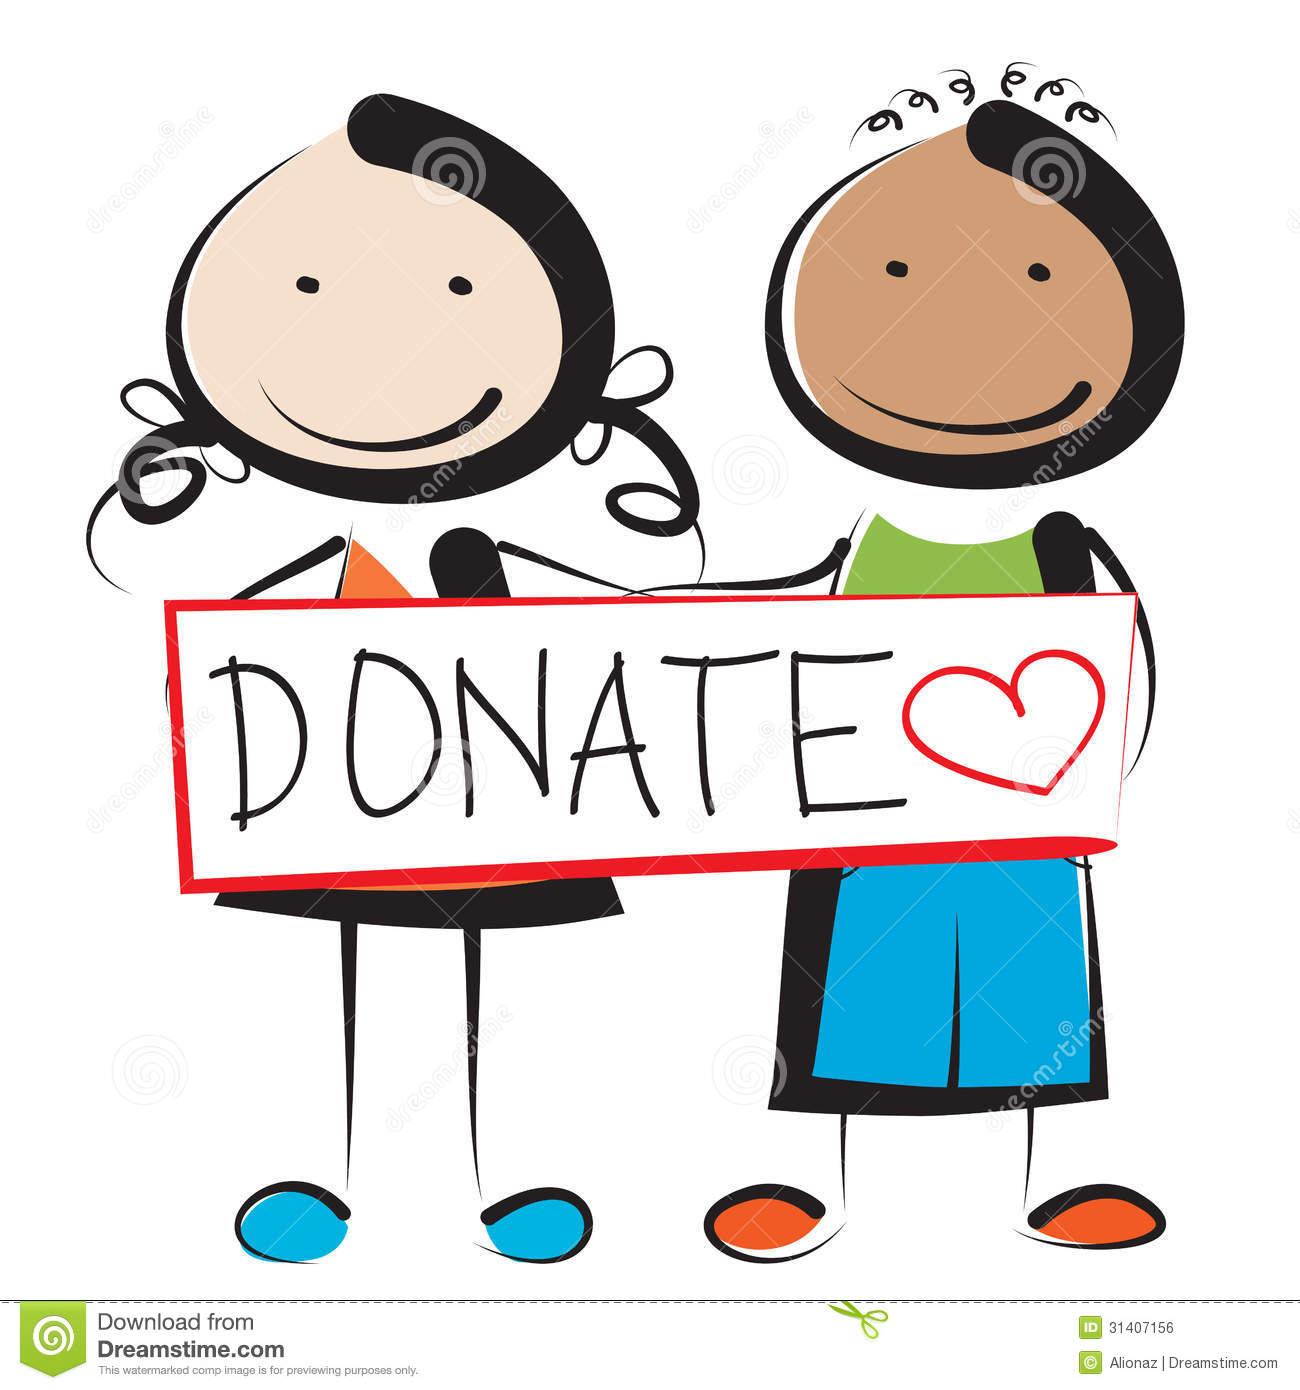 jpg royalty free library Donation clipart. Clip art free panda.